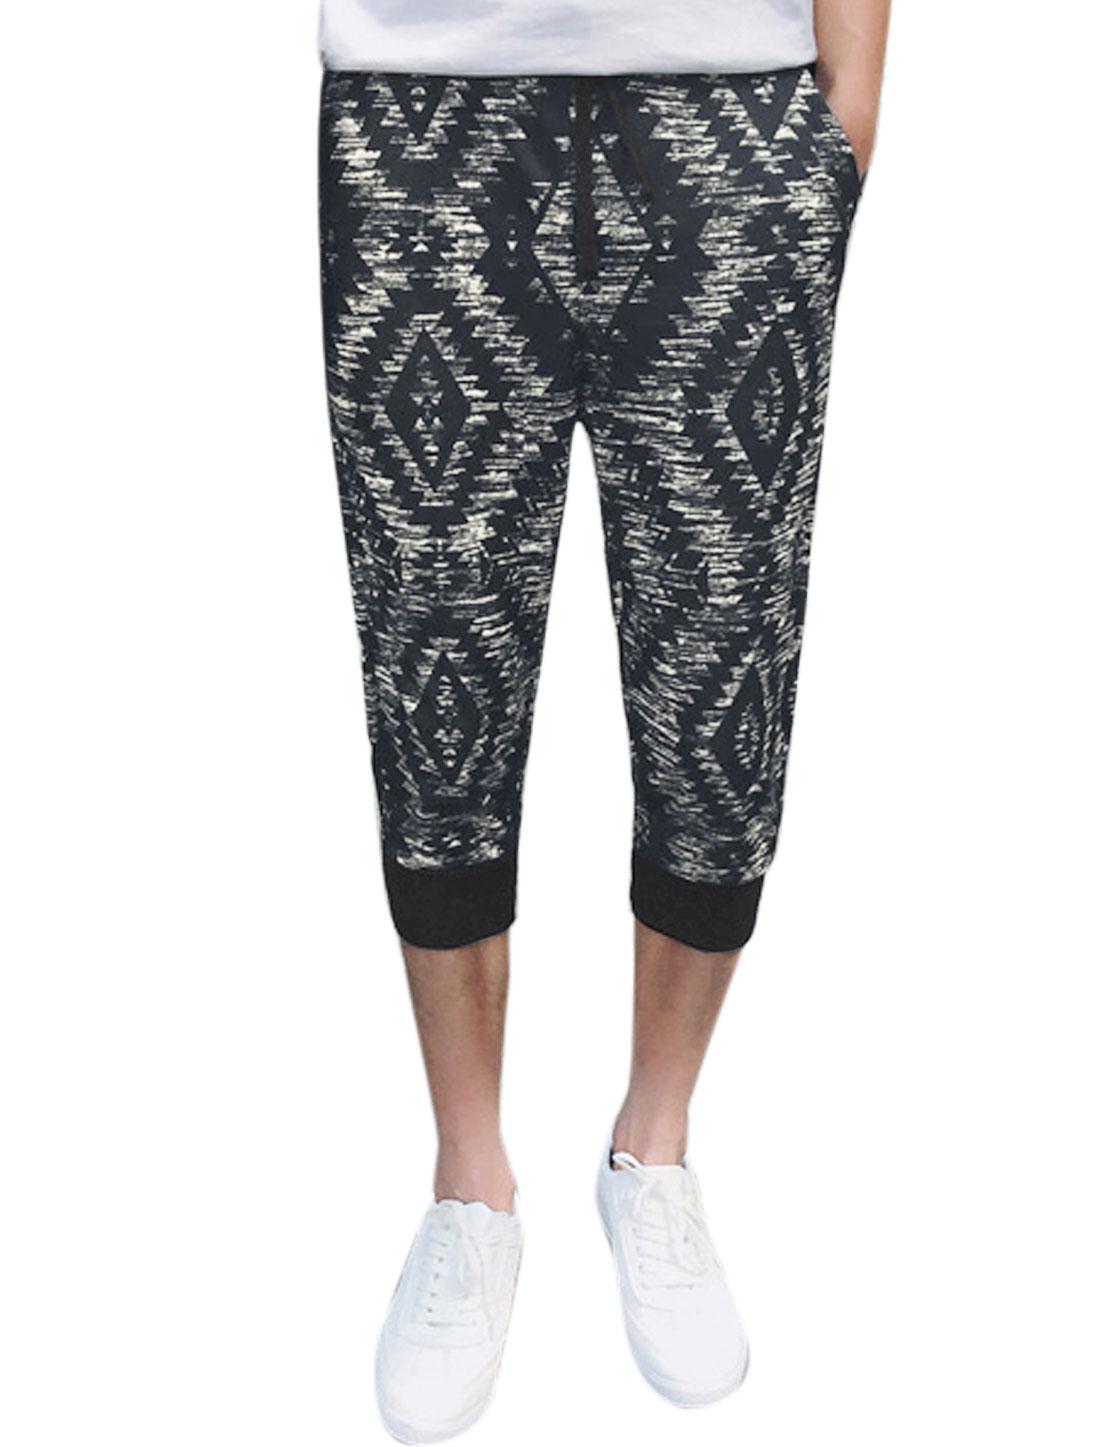 Men Zig-zag Geometric Prints Elastic Waist Capris Pants Black W30